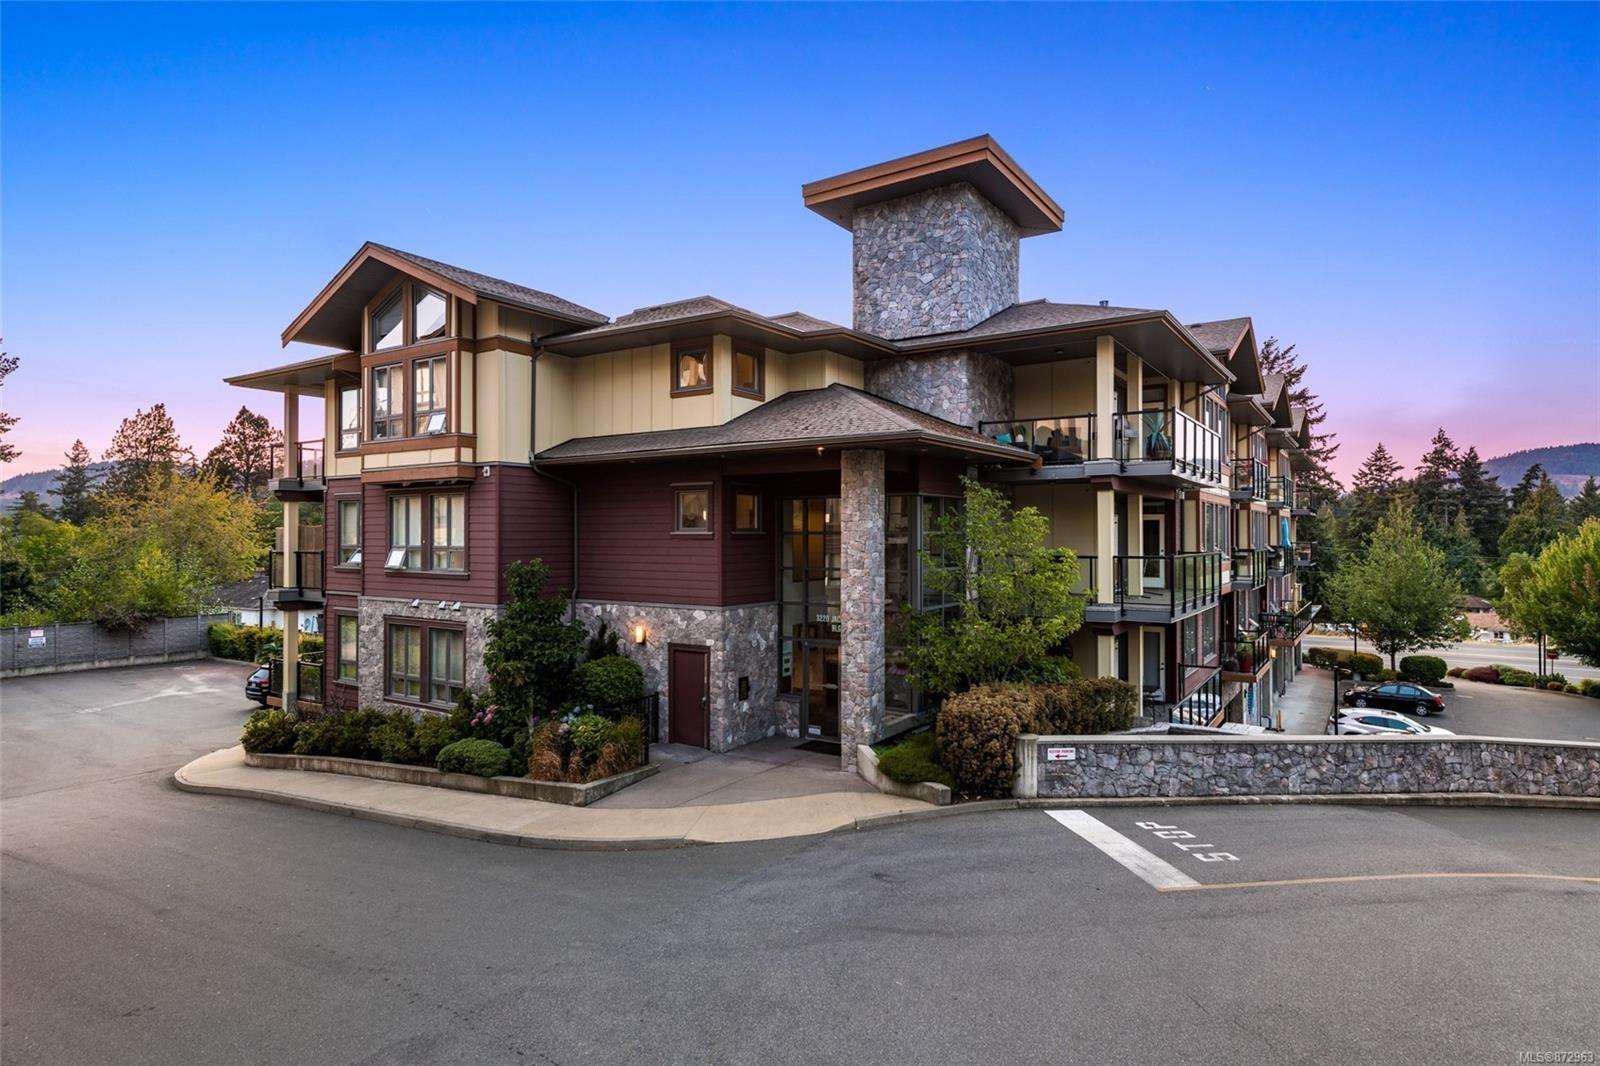 Main Photo: 204 3220 Jacklin Rd in : La Walfred Condo for sale (Langford)  : MLS®# 872963